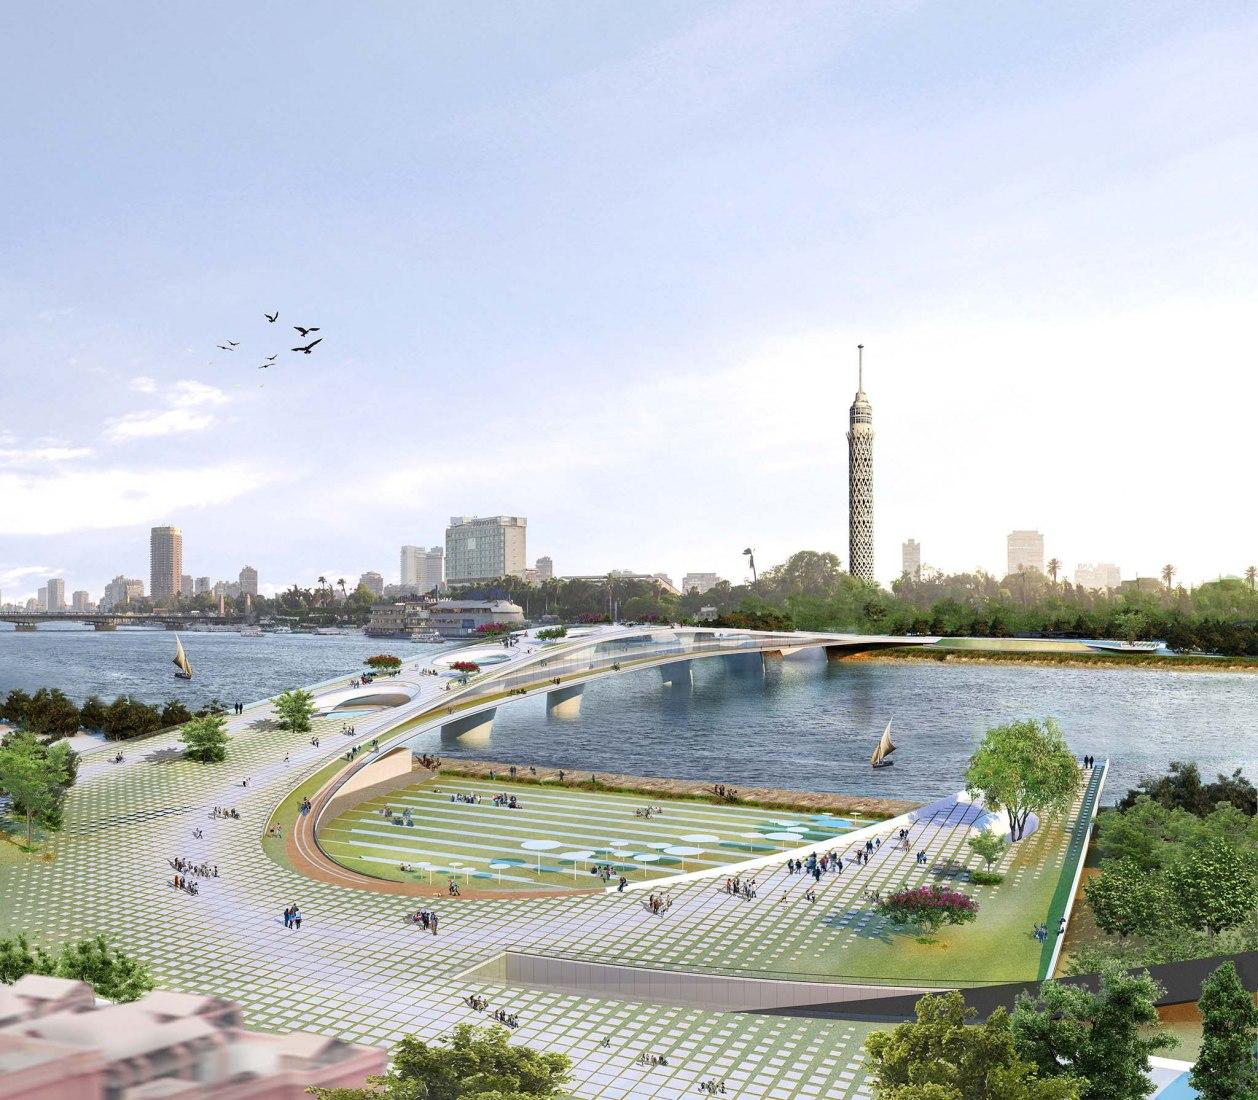 Puente peatonal sobre el Nilo por Rifat Chadirji Prize 2020 por Ali Khaled Elewa, Mostafa Ahmed Zakaria, Sherif Khaled Abdelkhaleq, Hoda Essam Abdelmawla y Ebtisam Elgizawy. Imágenes cortesía de Premio Rifat Chadirji 2020